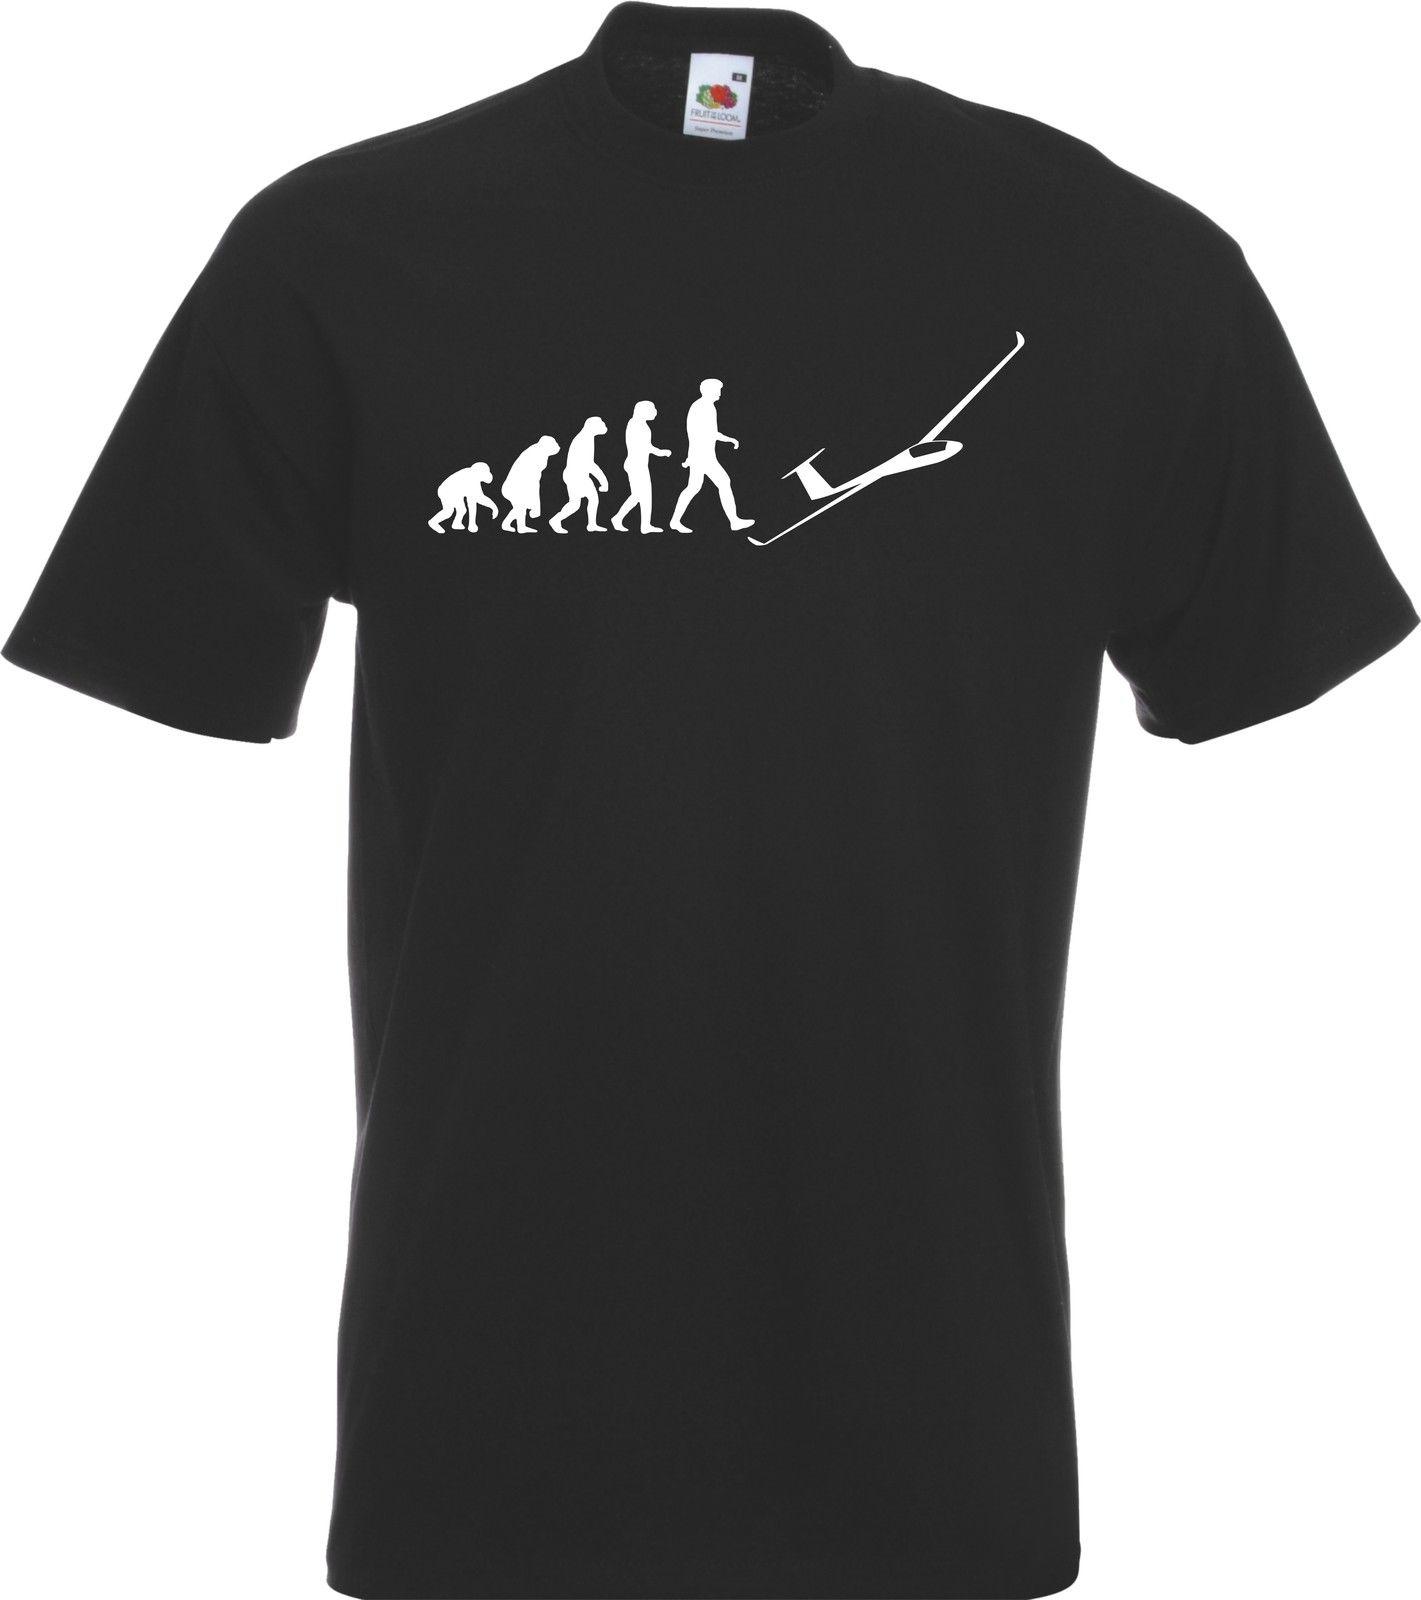 2019 Hot Koop Fashion Evolutie Van Glider Pilot Man Zweefvliegen T-shirt Tshirt Nieuwe Alle Maten Kleuren Gift Tee Shirt Verschillende Stijlen